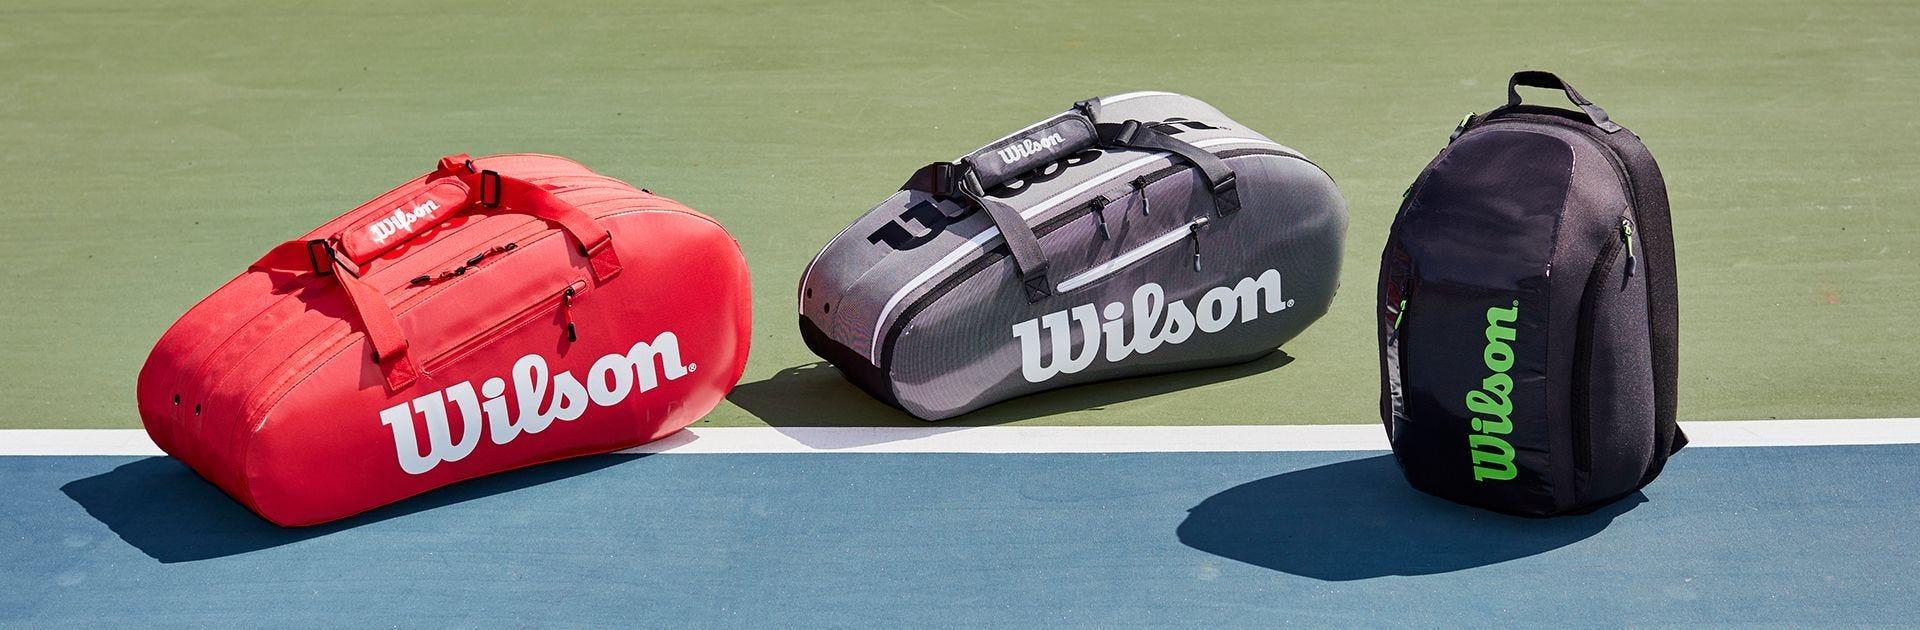 Tour Tennis Bag range on a tennis court